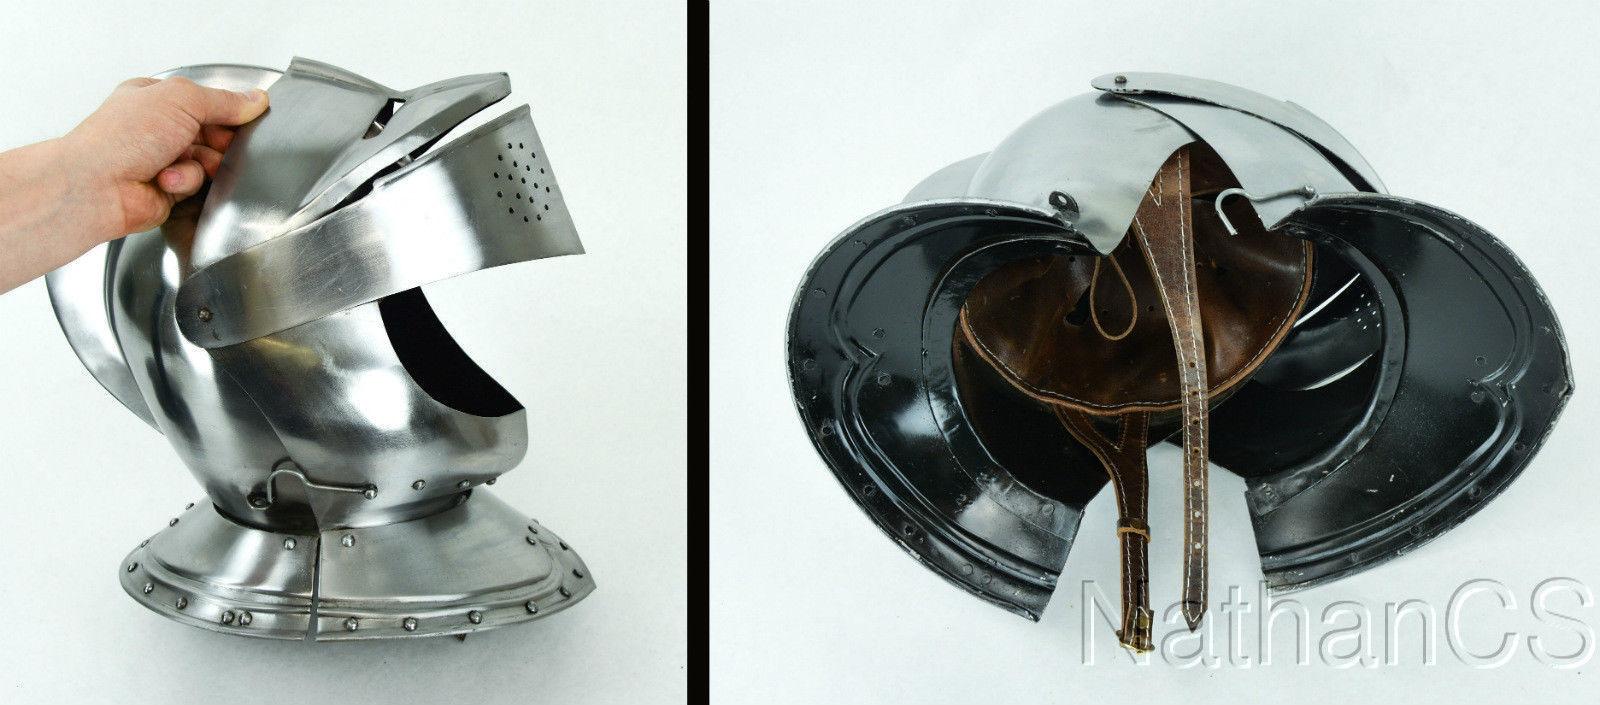 New Knight Medieval European Closed Knights Armors Helmet 300 SPARTAN